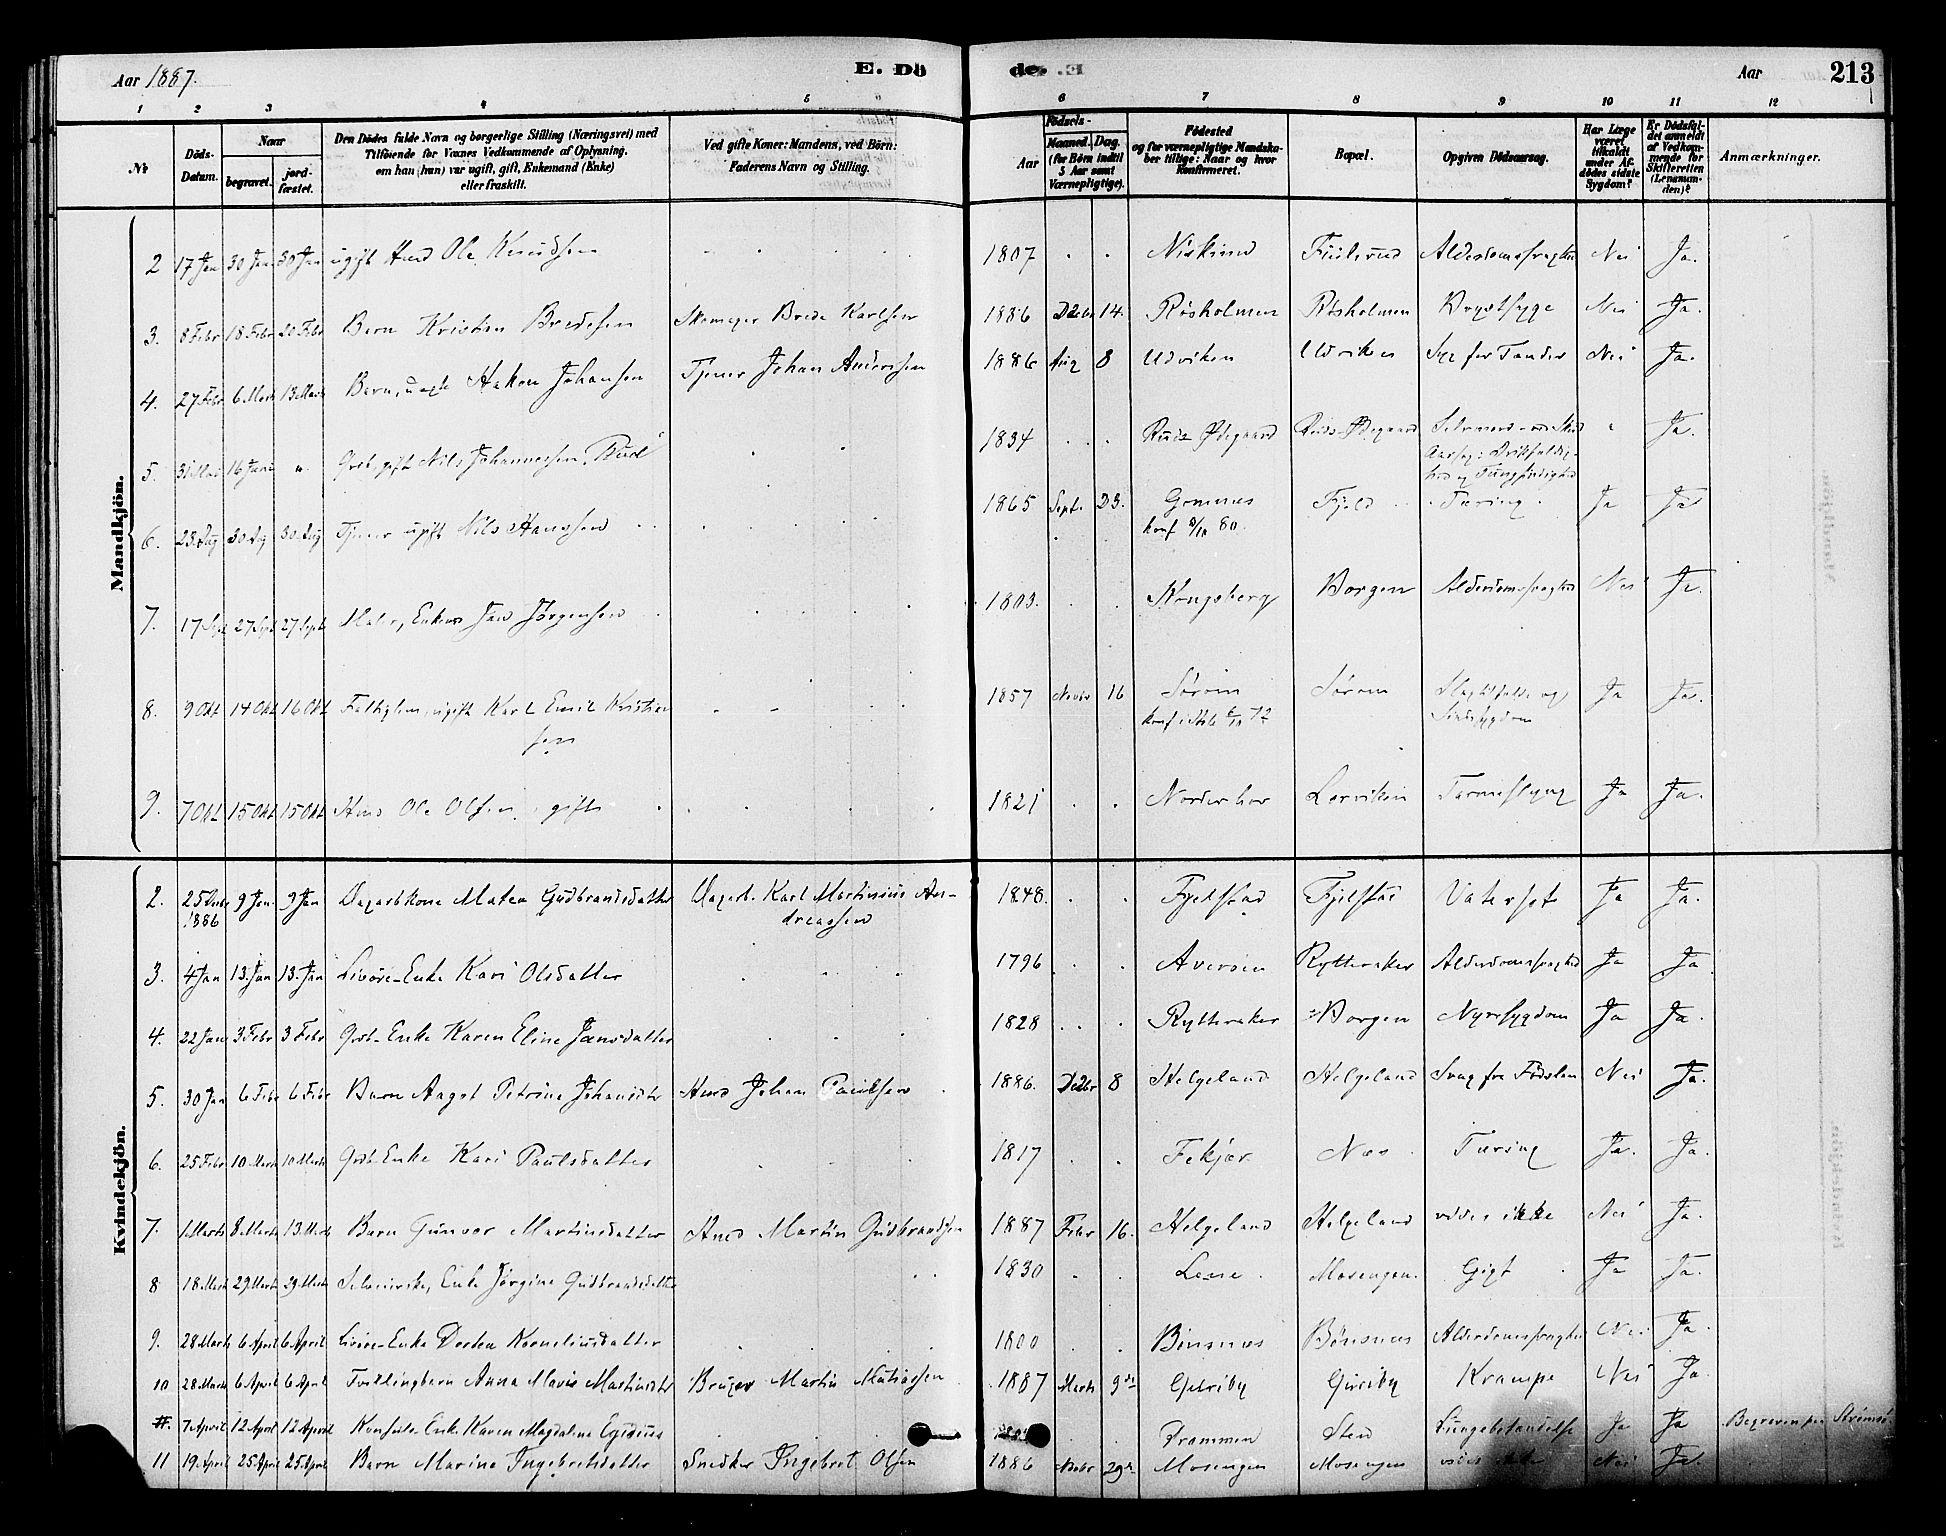 SAKO, Hole kirkebøker, F/Fa/L0008: Ministerialbok nr. I 8, 1878-1891, s. 213